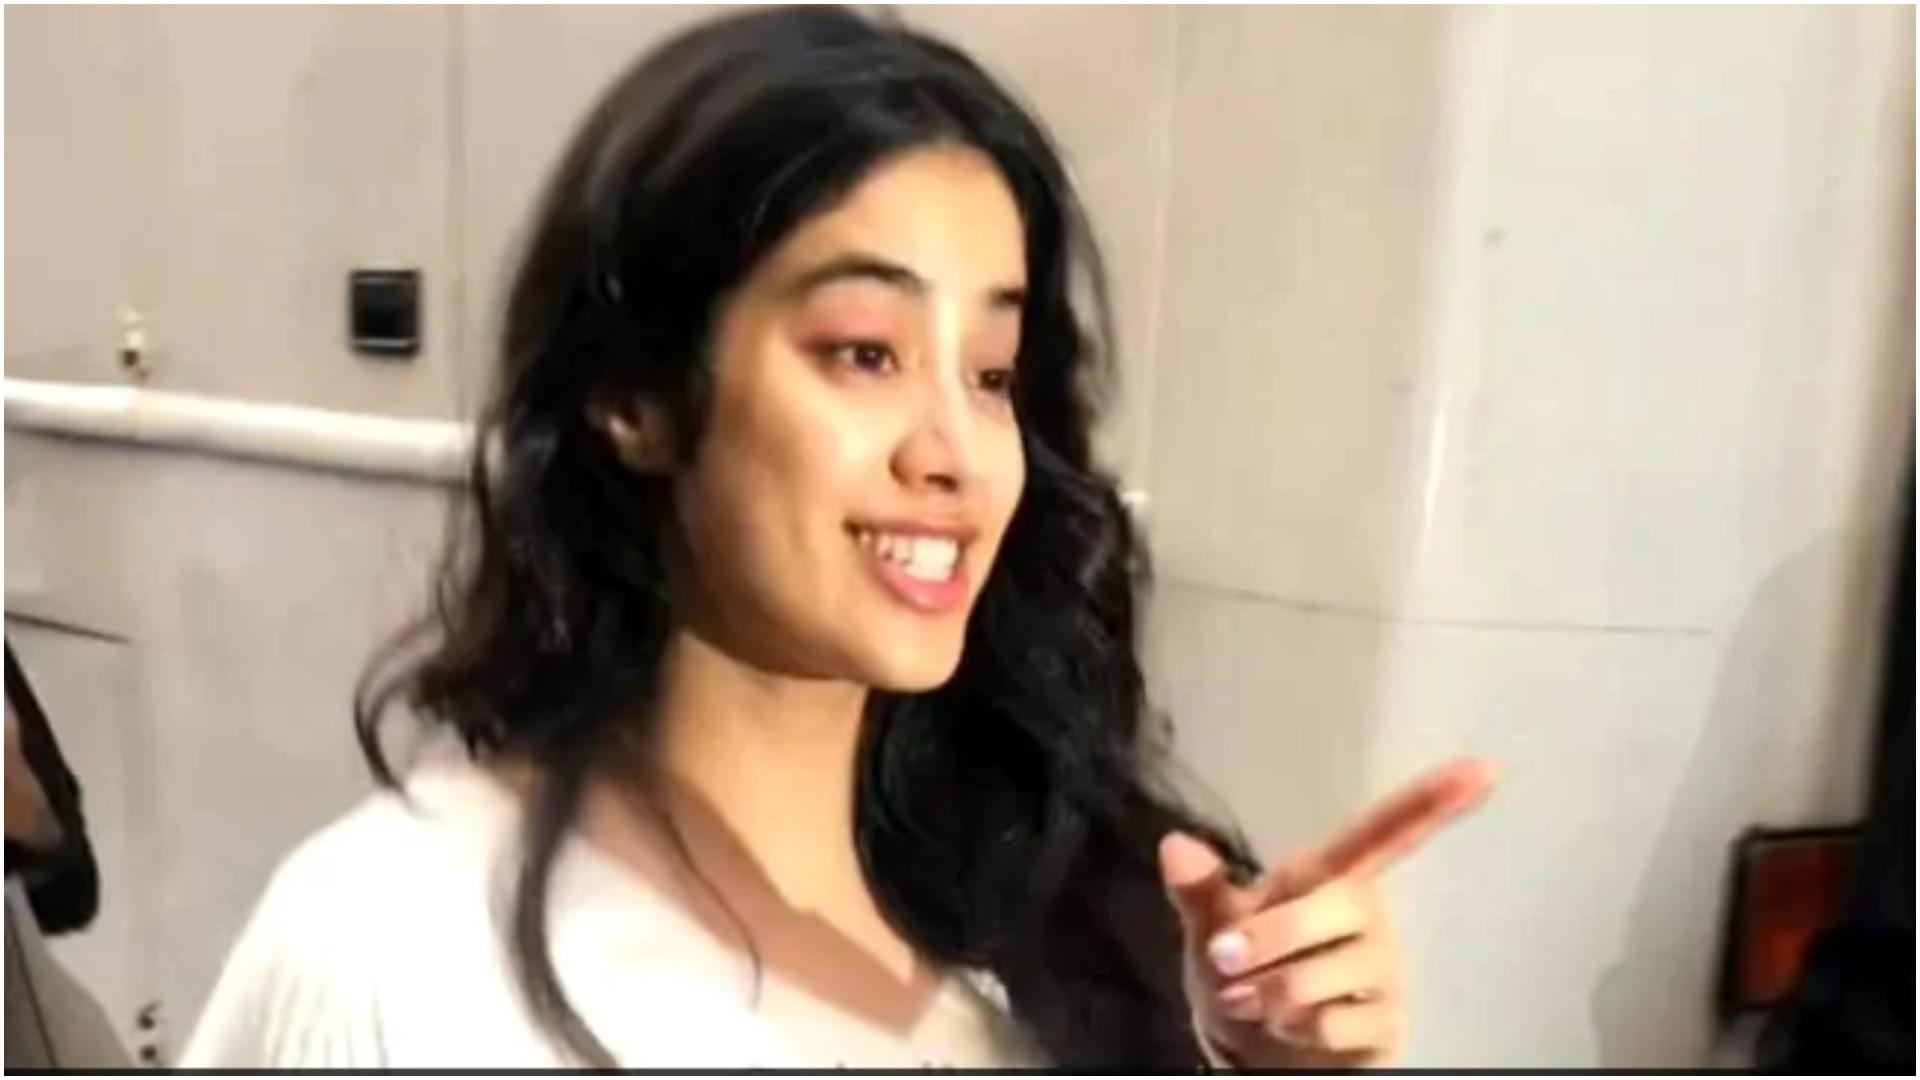 वीडियो: जान्हवी कपूर को सारा अली खान कह बुलाया तो, फोटोग्राफर को मिली ये चेतावनी